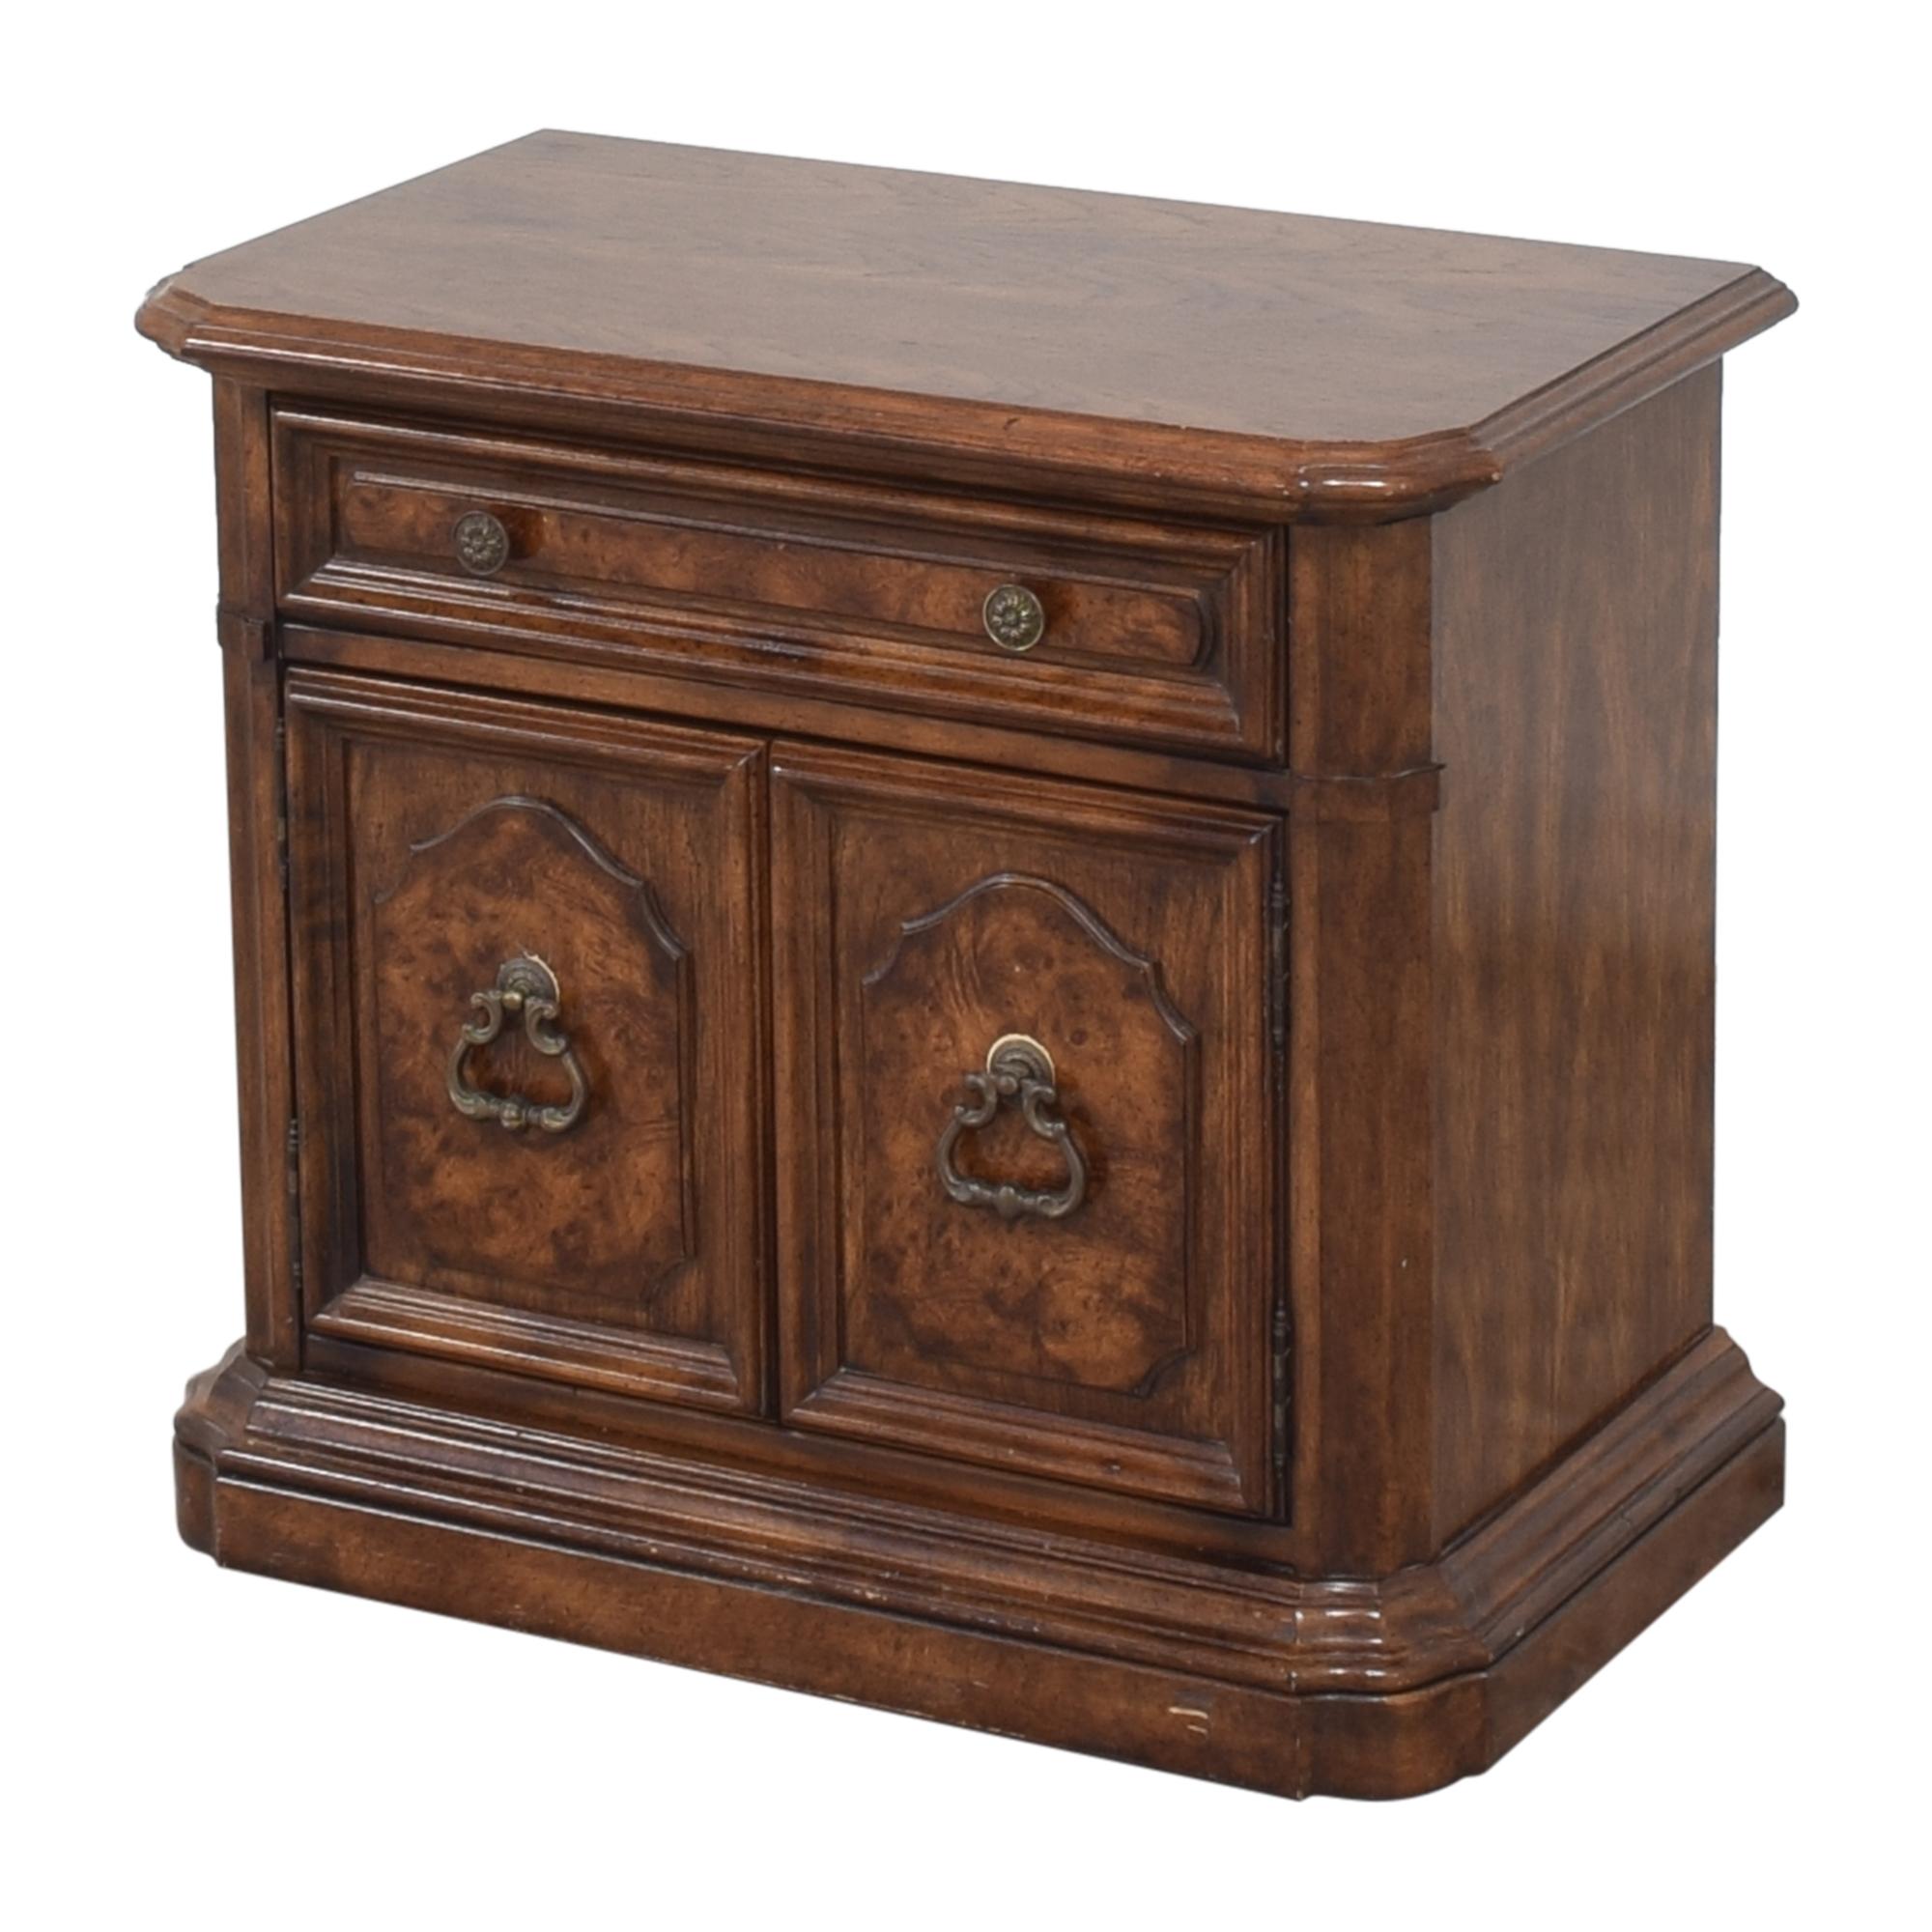 Stanley Furniture Cabinet Nightstand sale